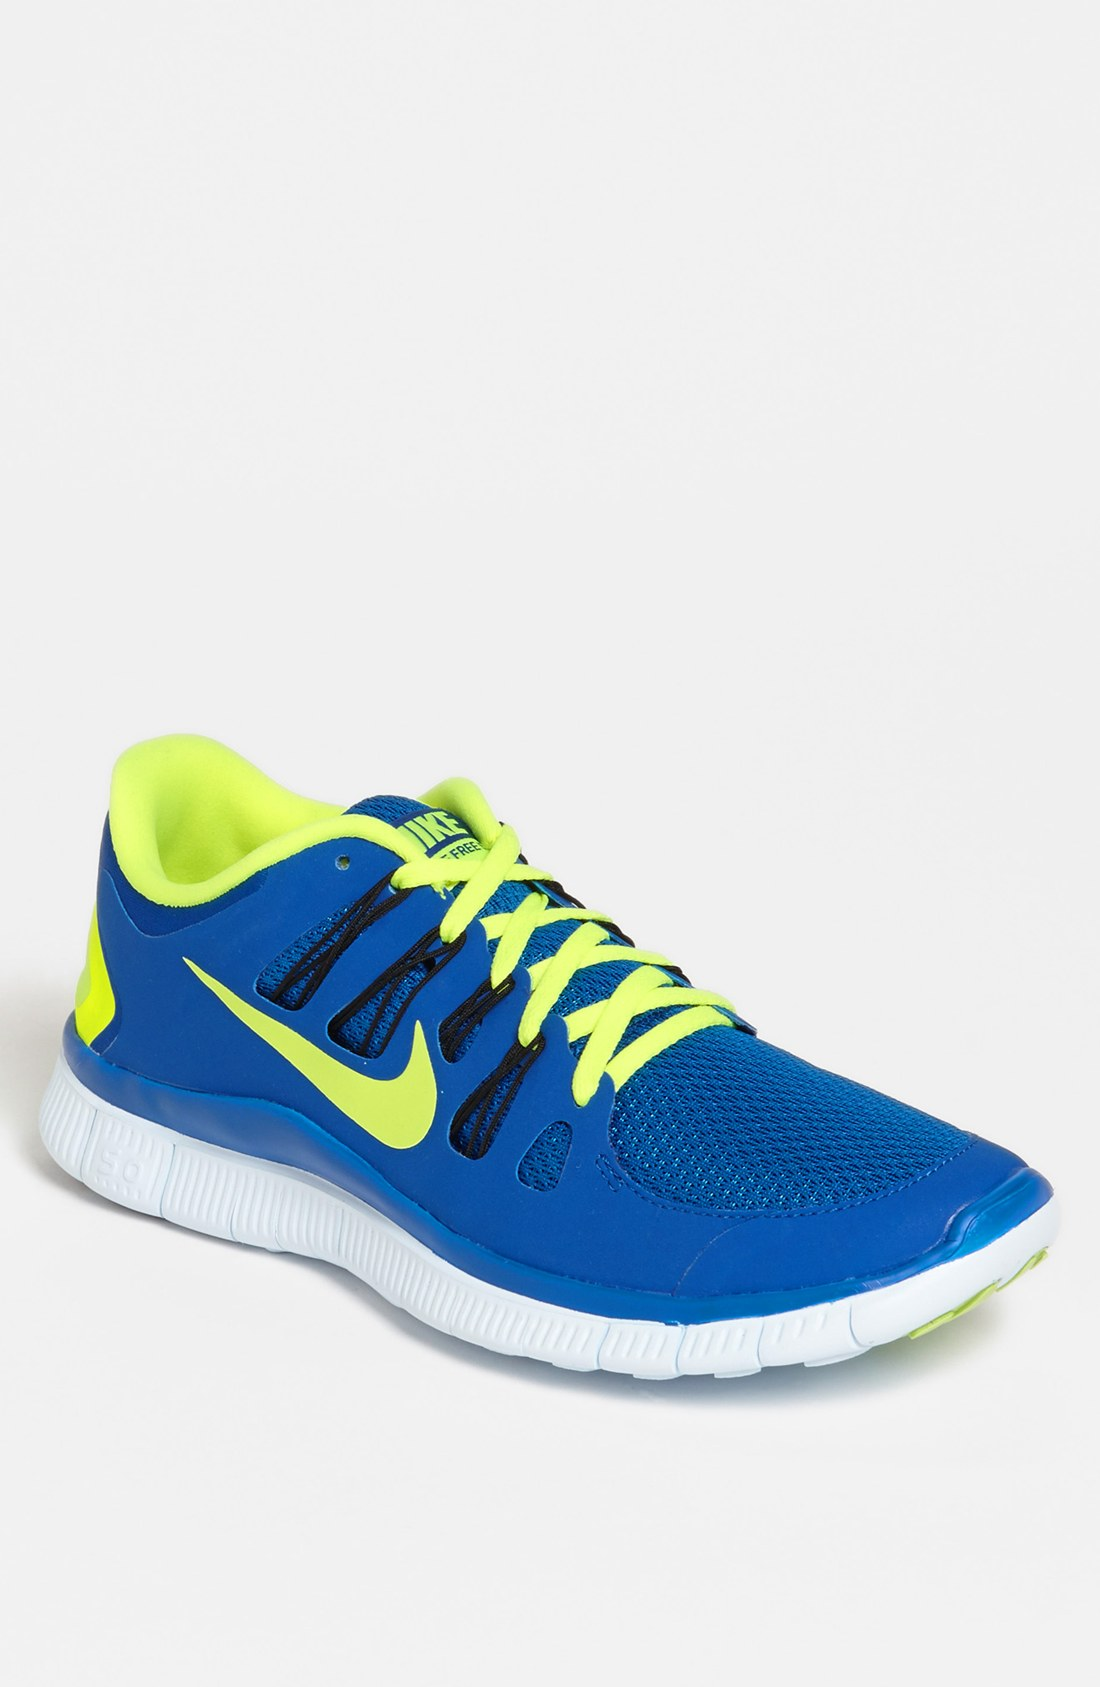 nike free shoe